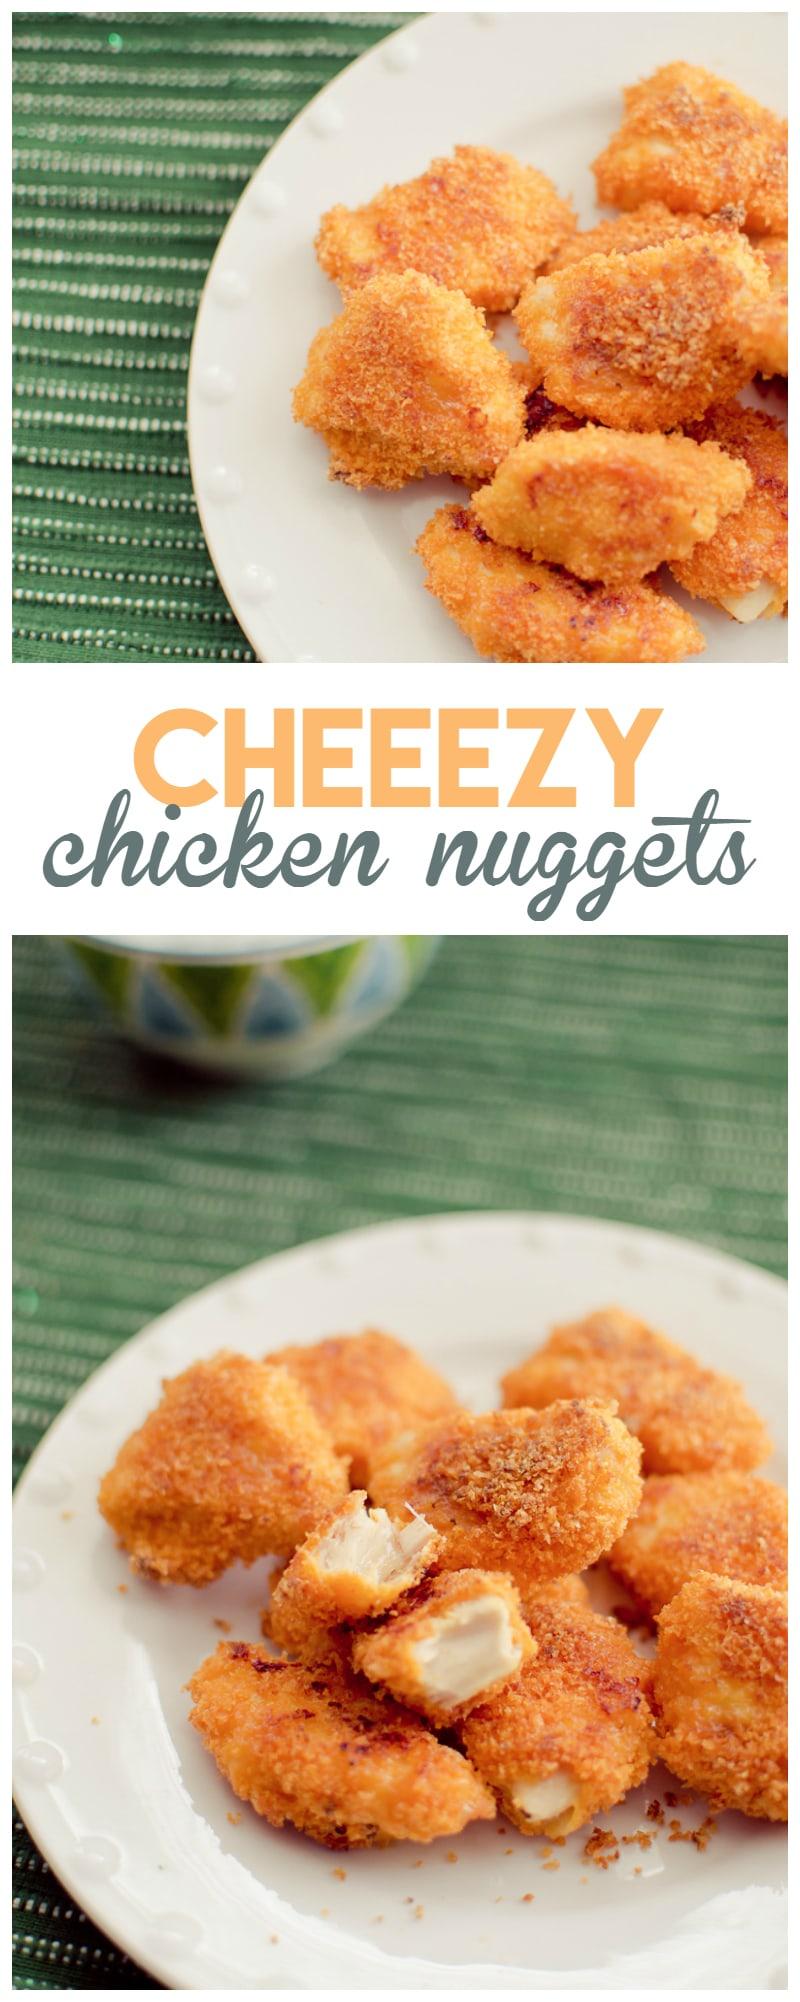 cheezy chicken nuggets